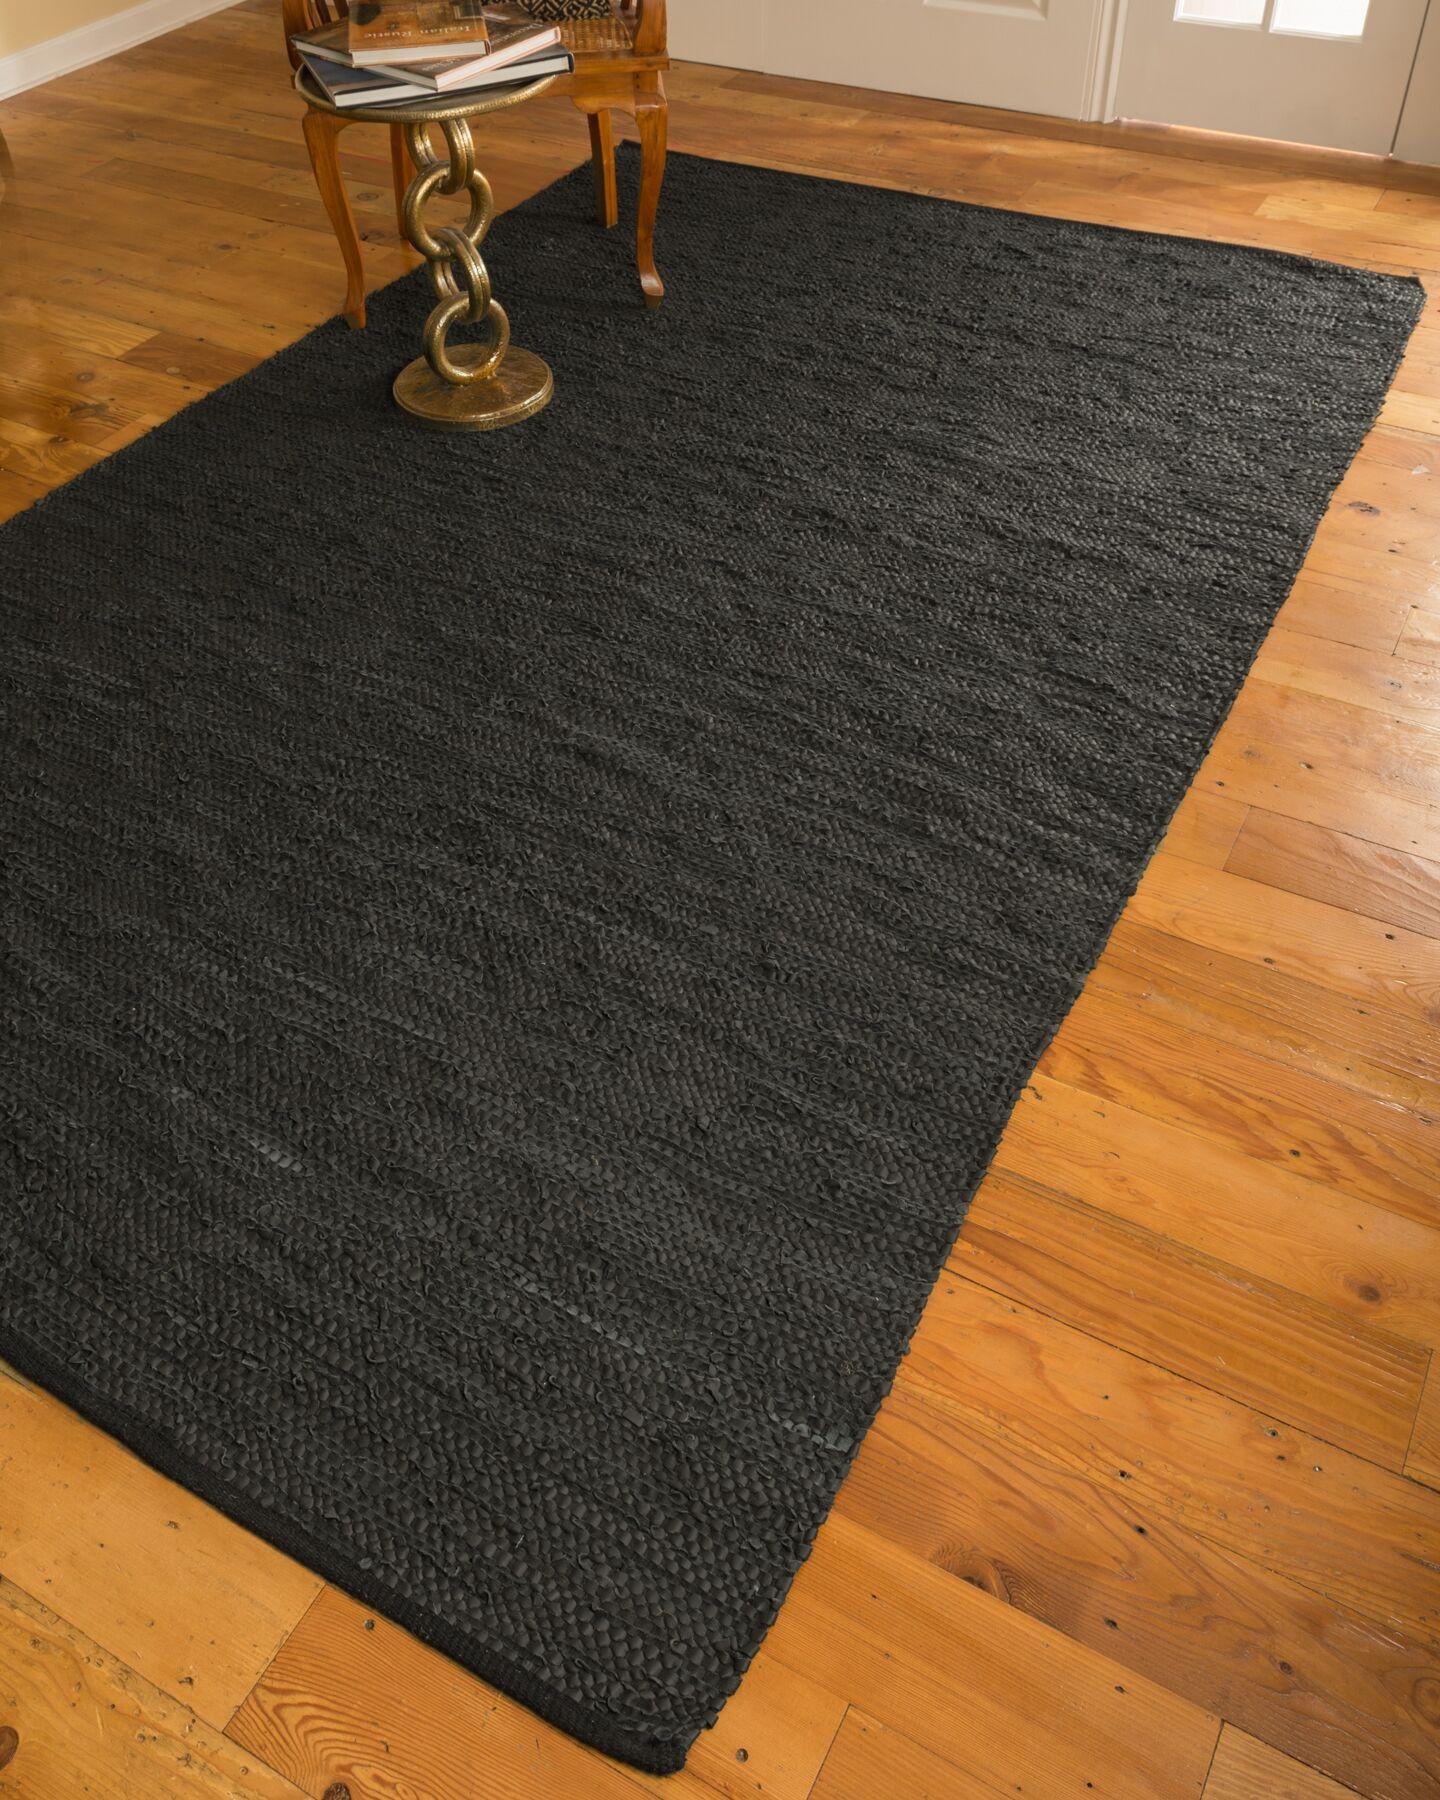 Hand-Loomed Black Area Rug Rug Size: Rectangle 6' x 9'